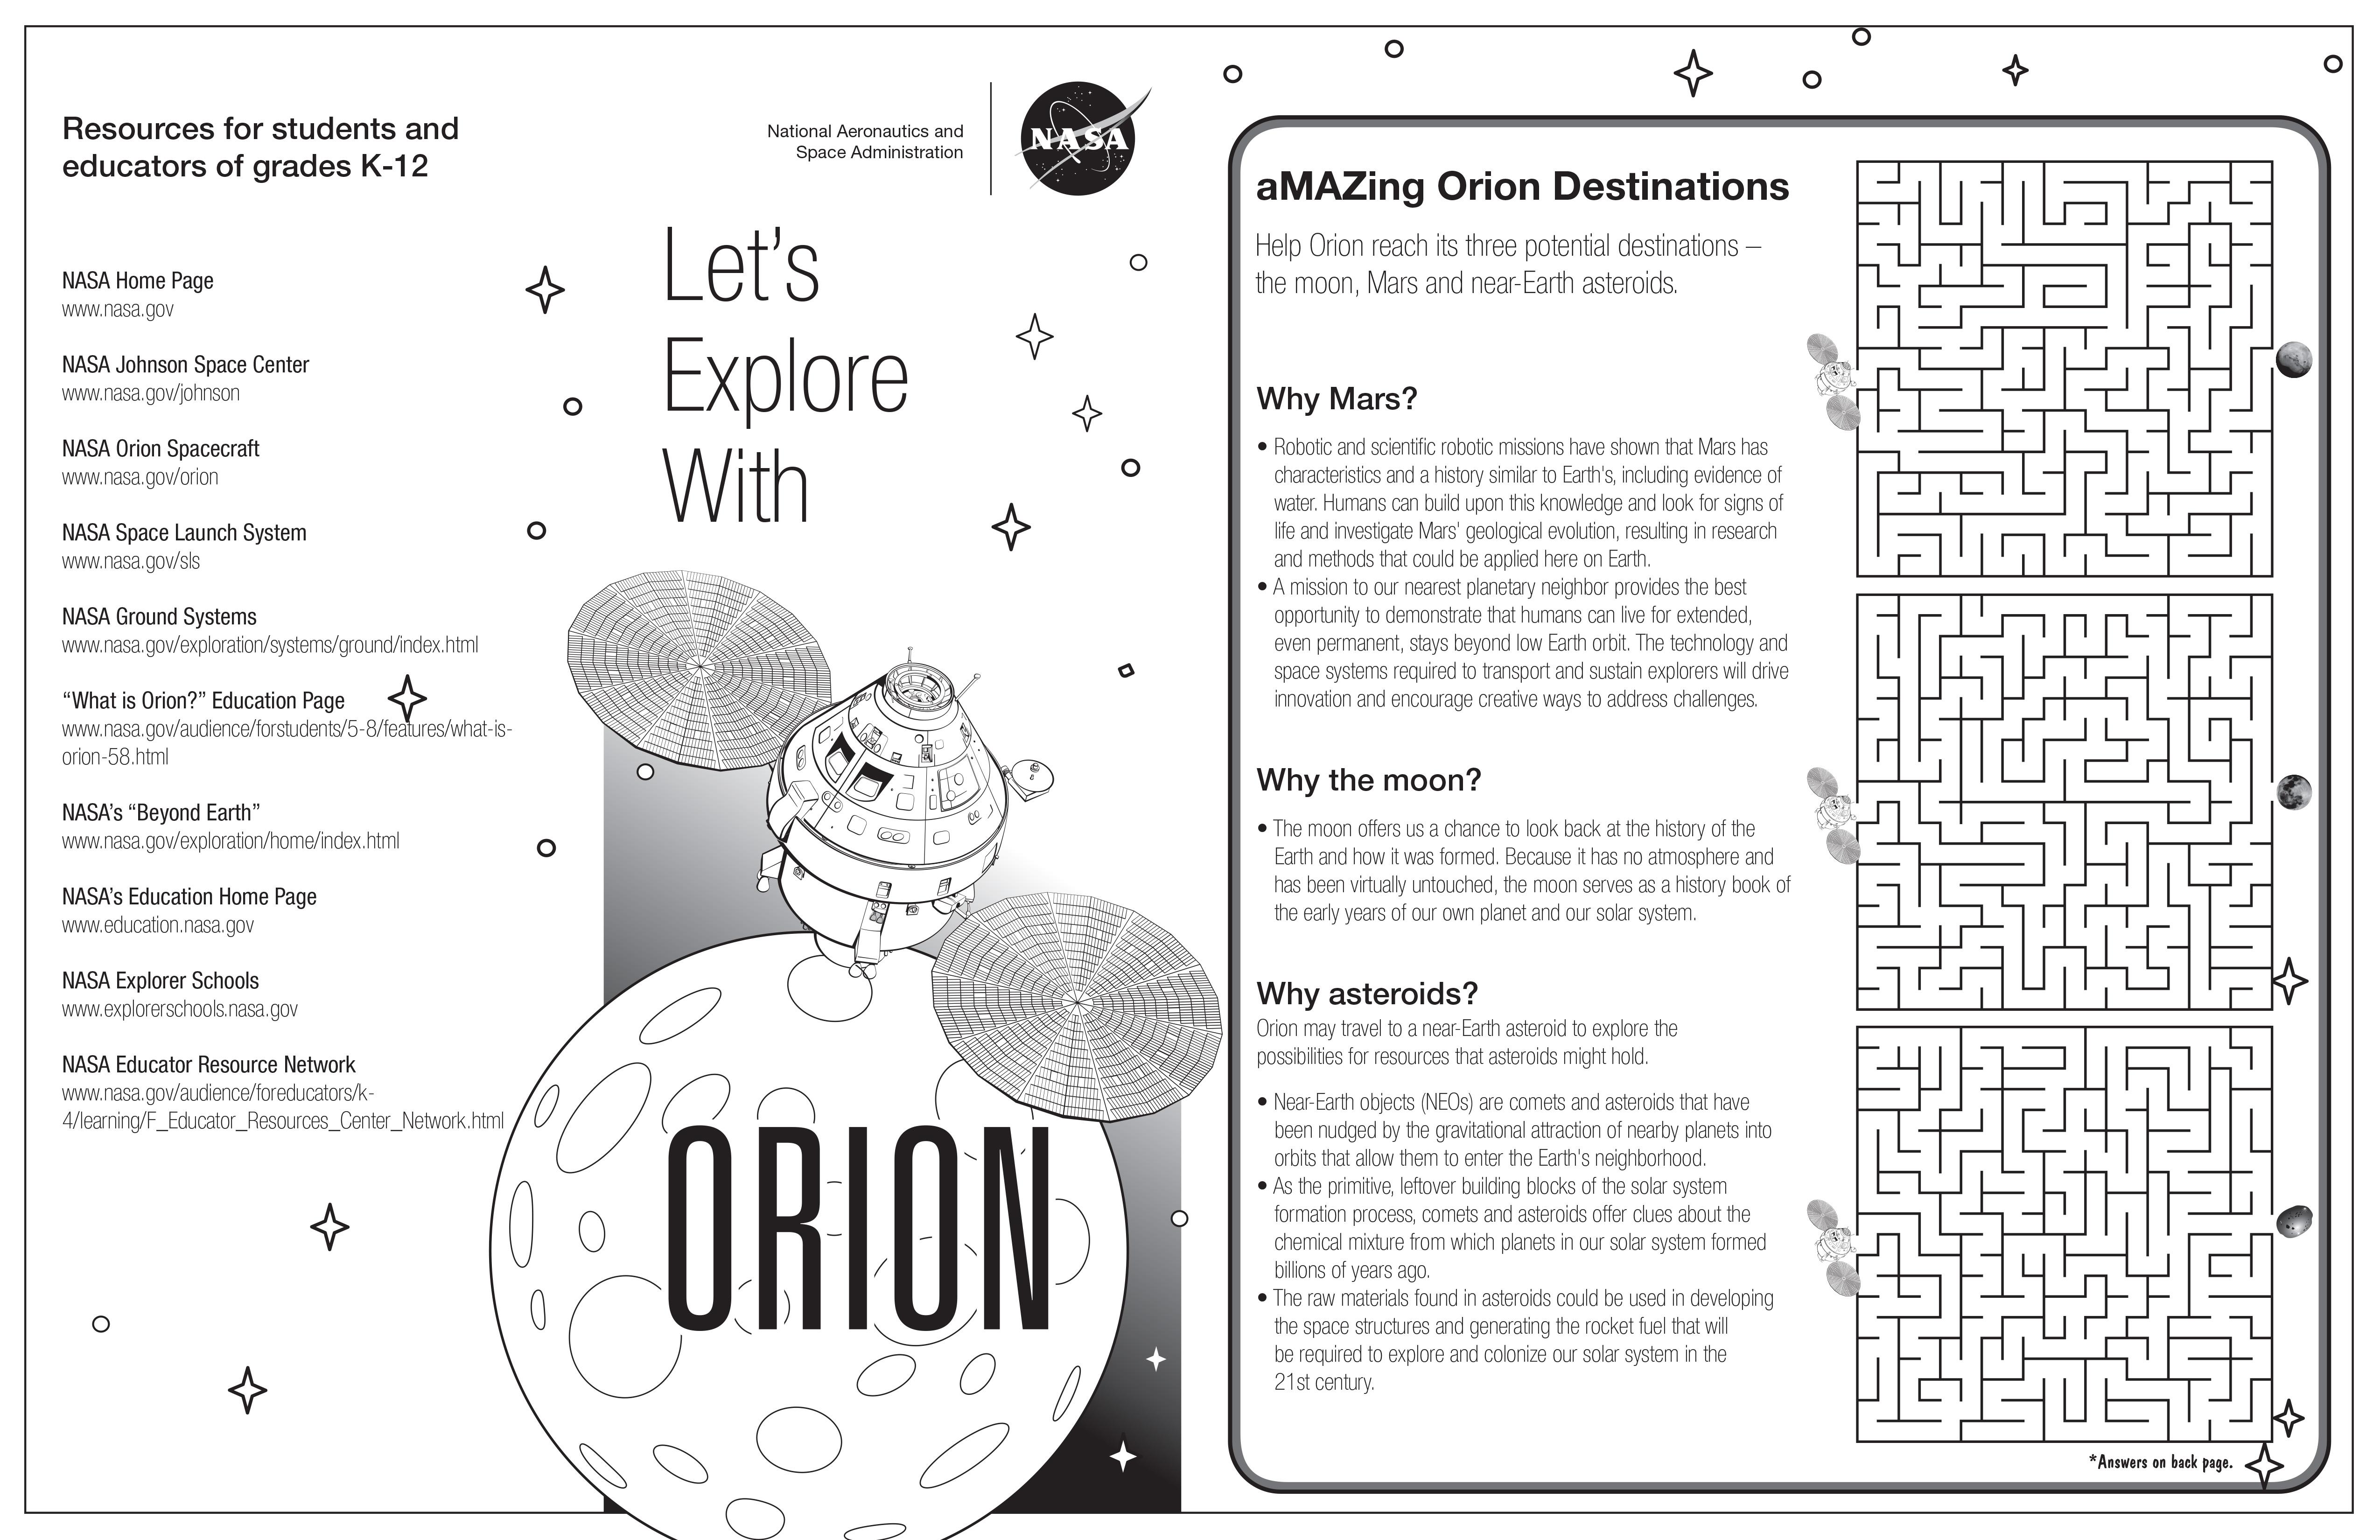 704736main_OrionActivitySheetONE-revised10-16-12